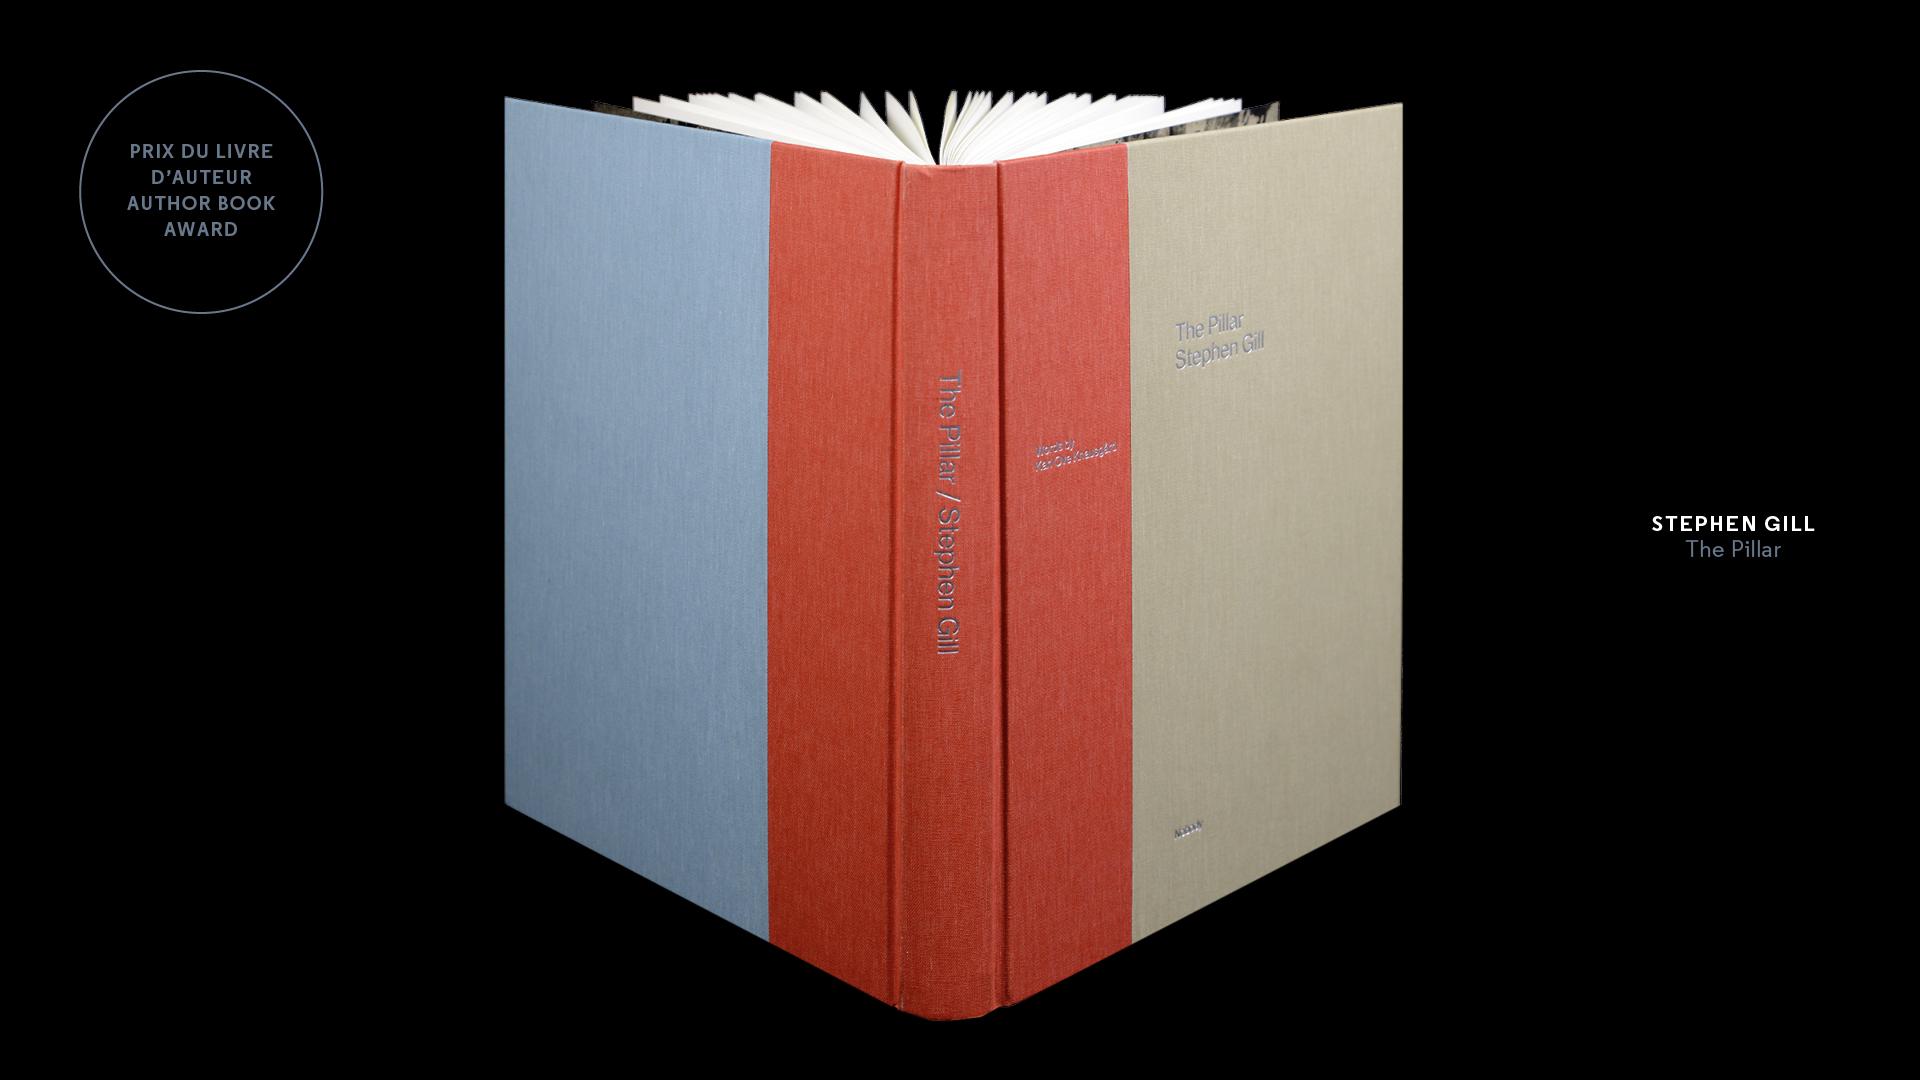 Winner of the Author's Book Award:  Stephen Gill  The Pillar   Publisher: Nobody. Graphic Design: Greger Ulf Nilson. Text: Karl Ove Knausgard